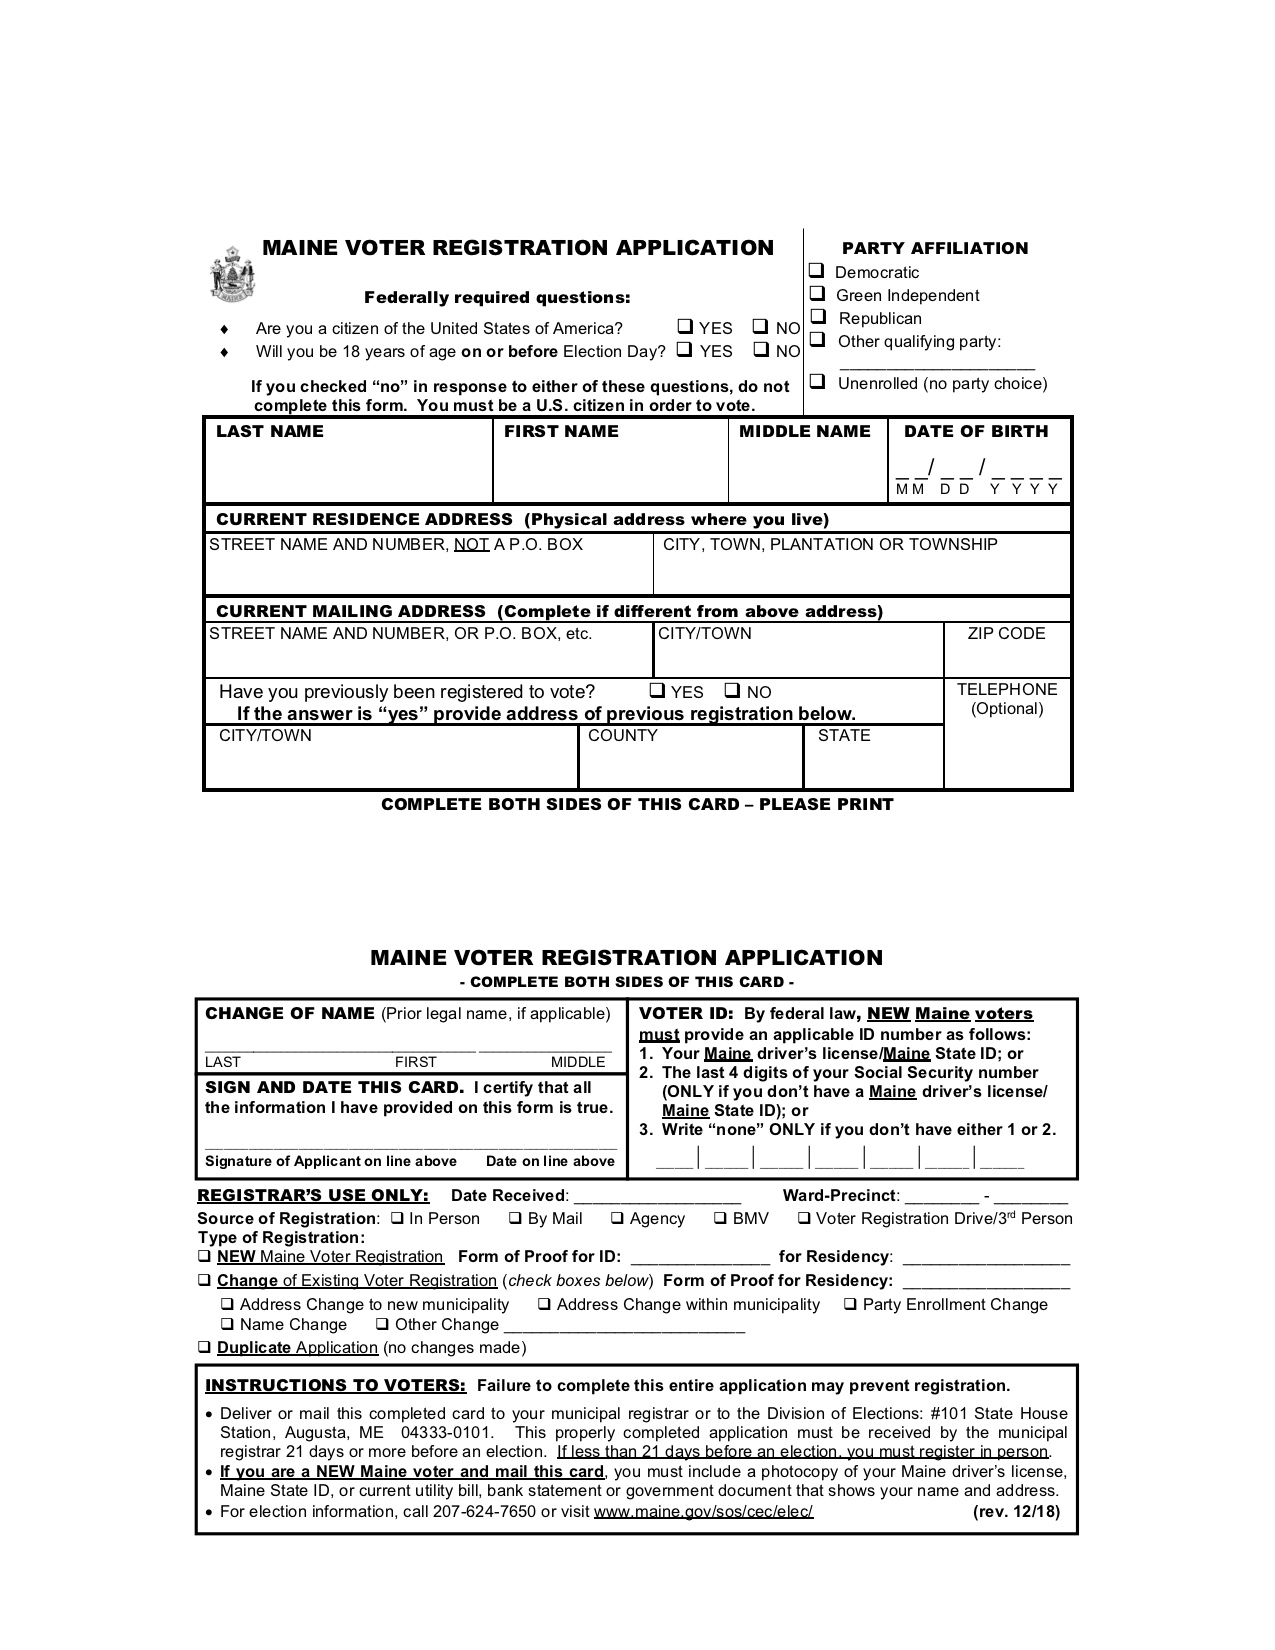 Maine_Voter_Registration_Card.jpg